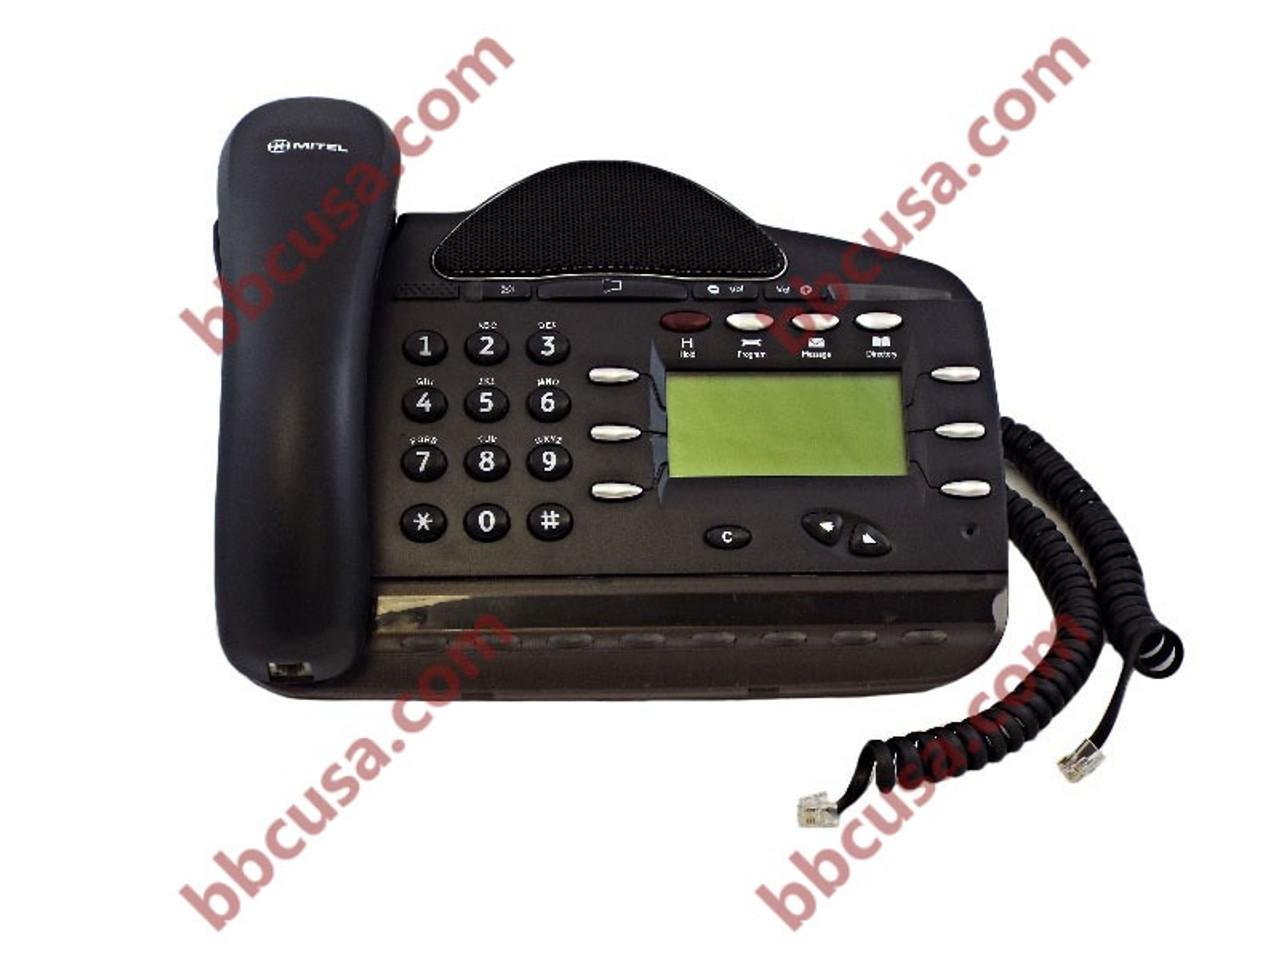 Mitel 4110 8 Button Full Duplex Phone LR5829.06200